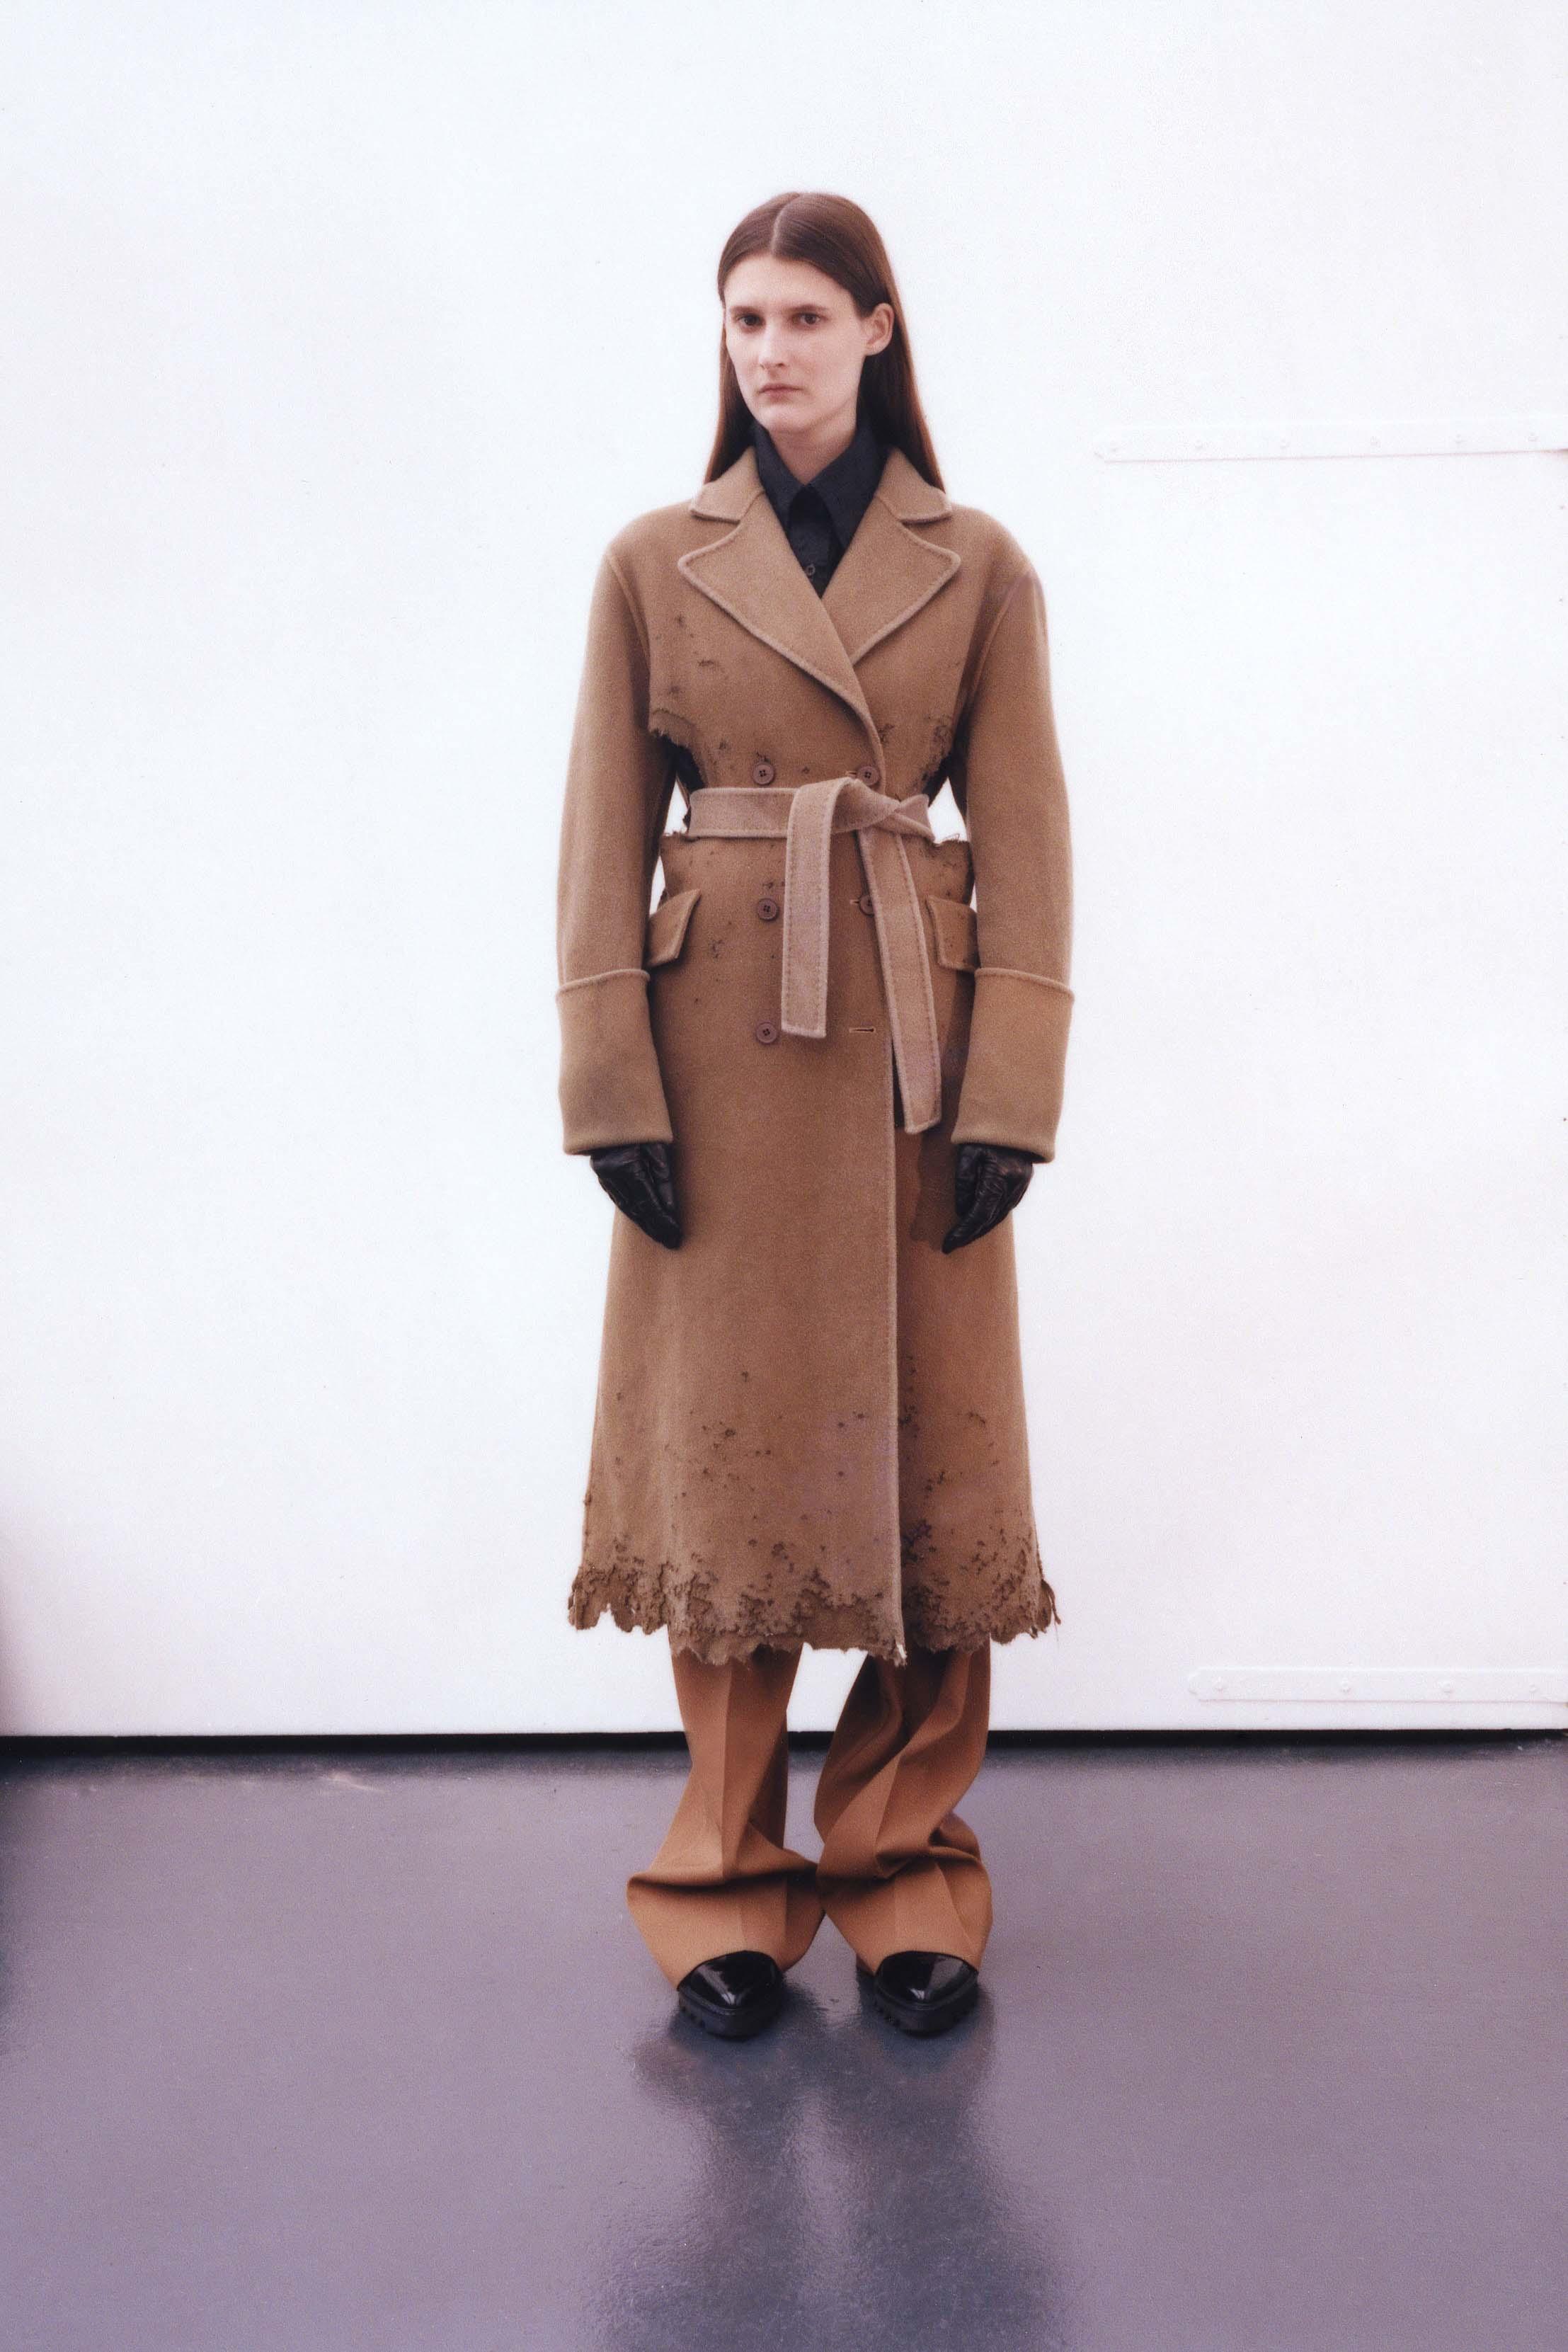 Yang Li F/W17 Women's - Paris - Yang Li, StyleZeitgiest, PFW, Paris, FW17, Fashion, Fall Winter, 2017